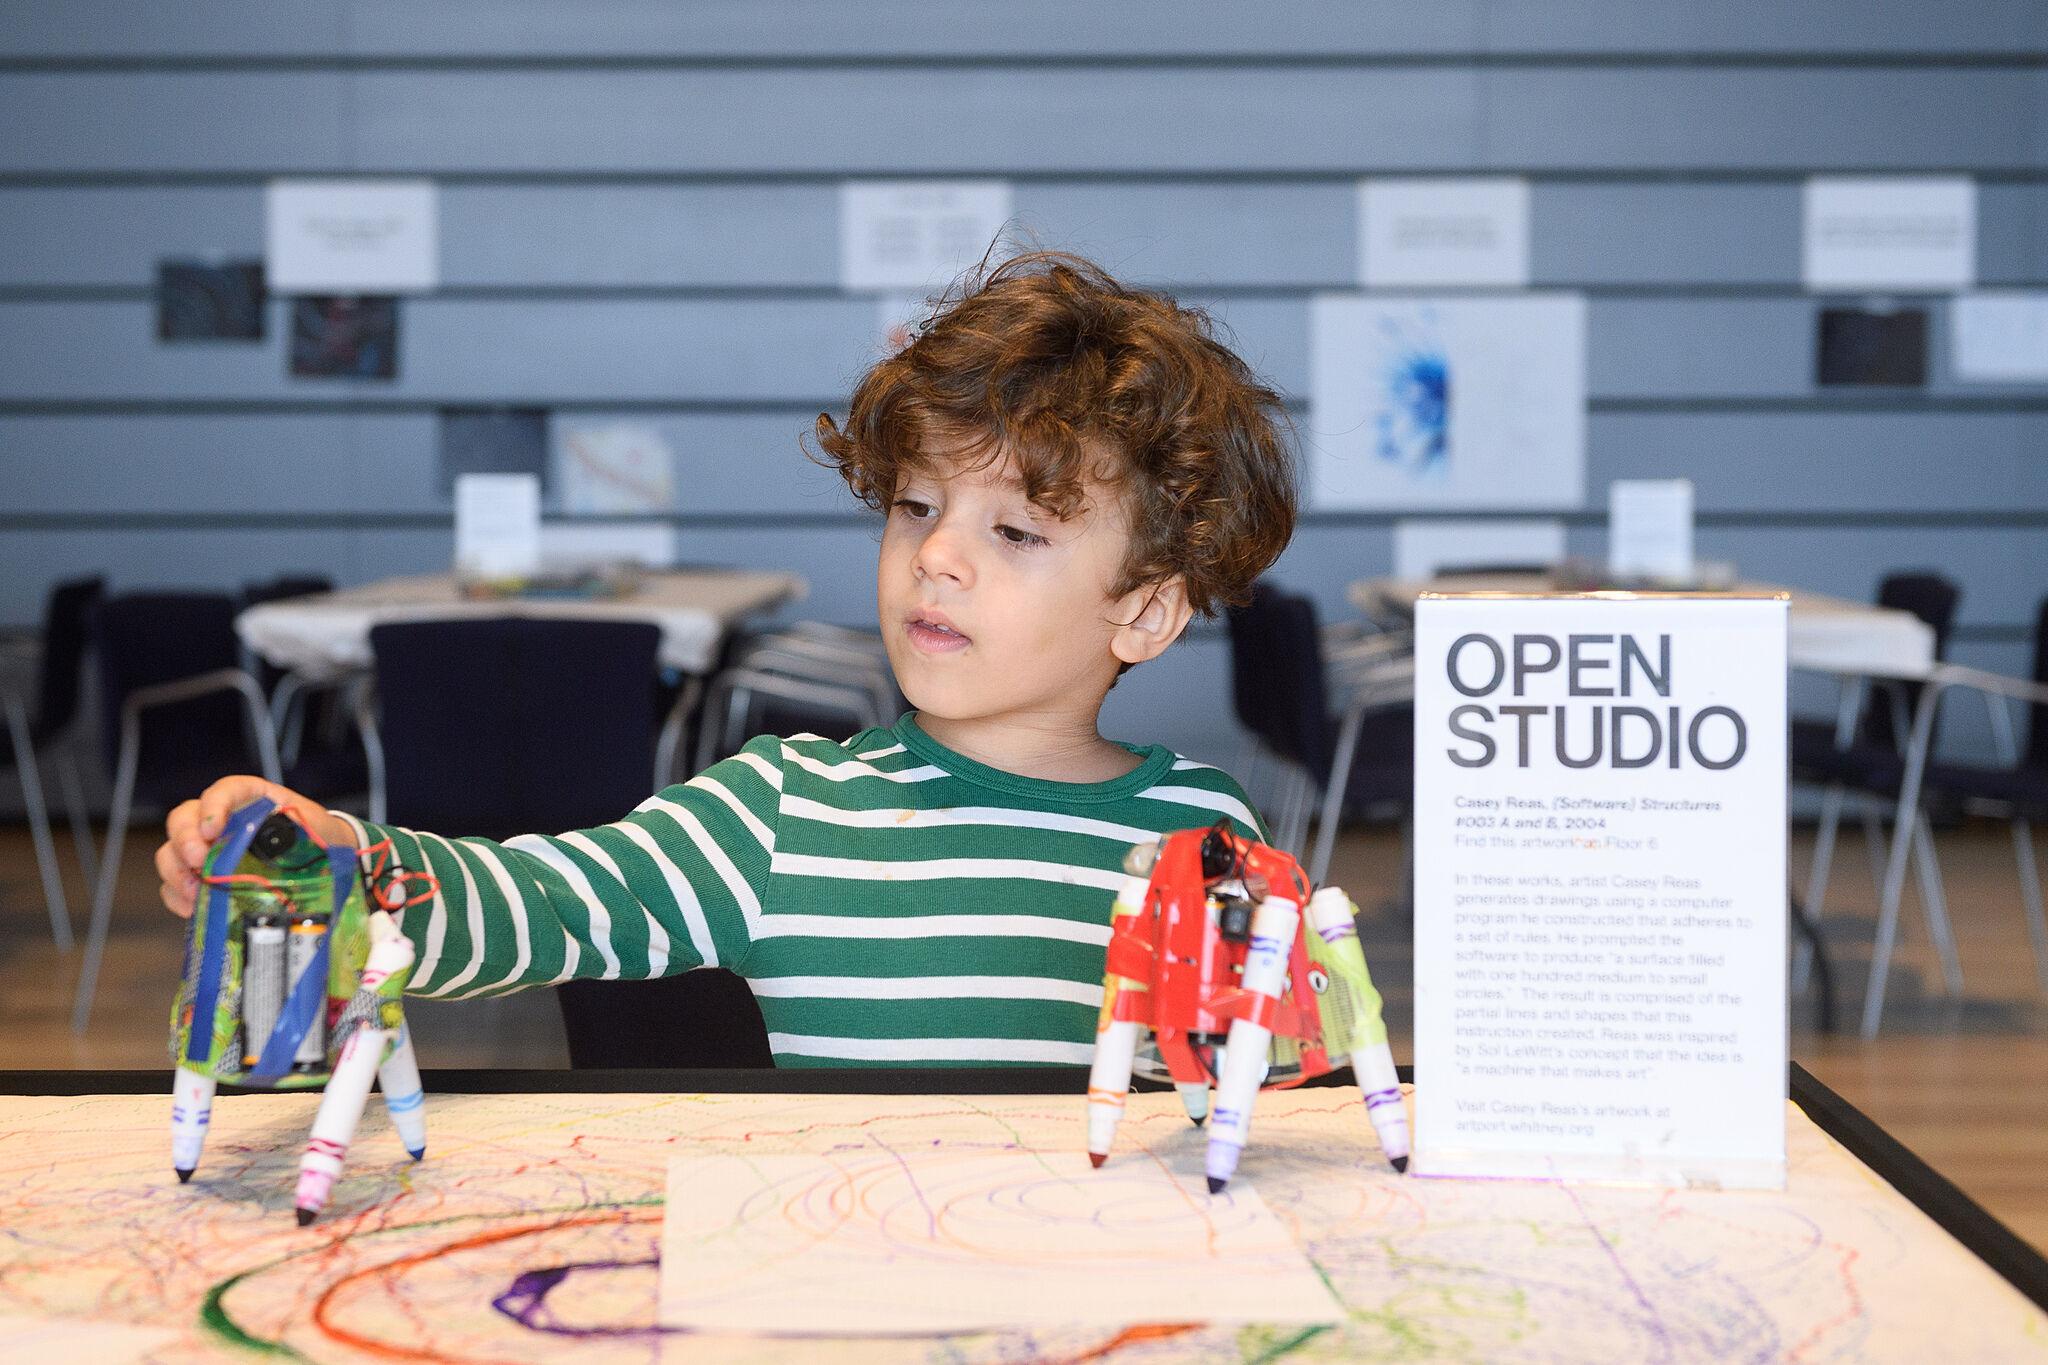 A child making art in Open Studio.